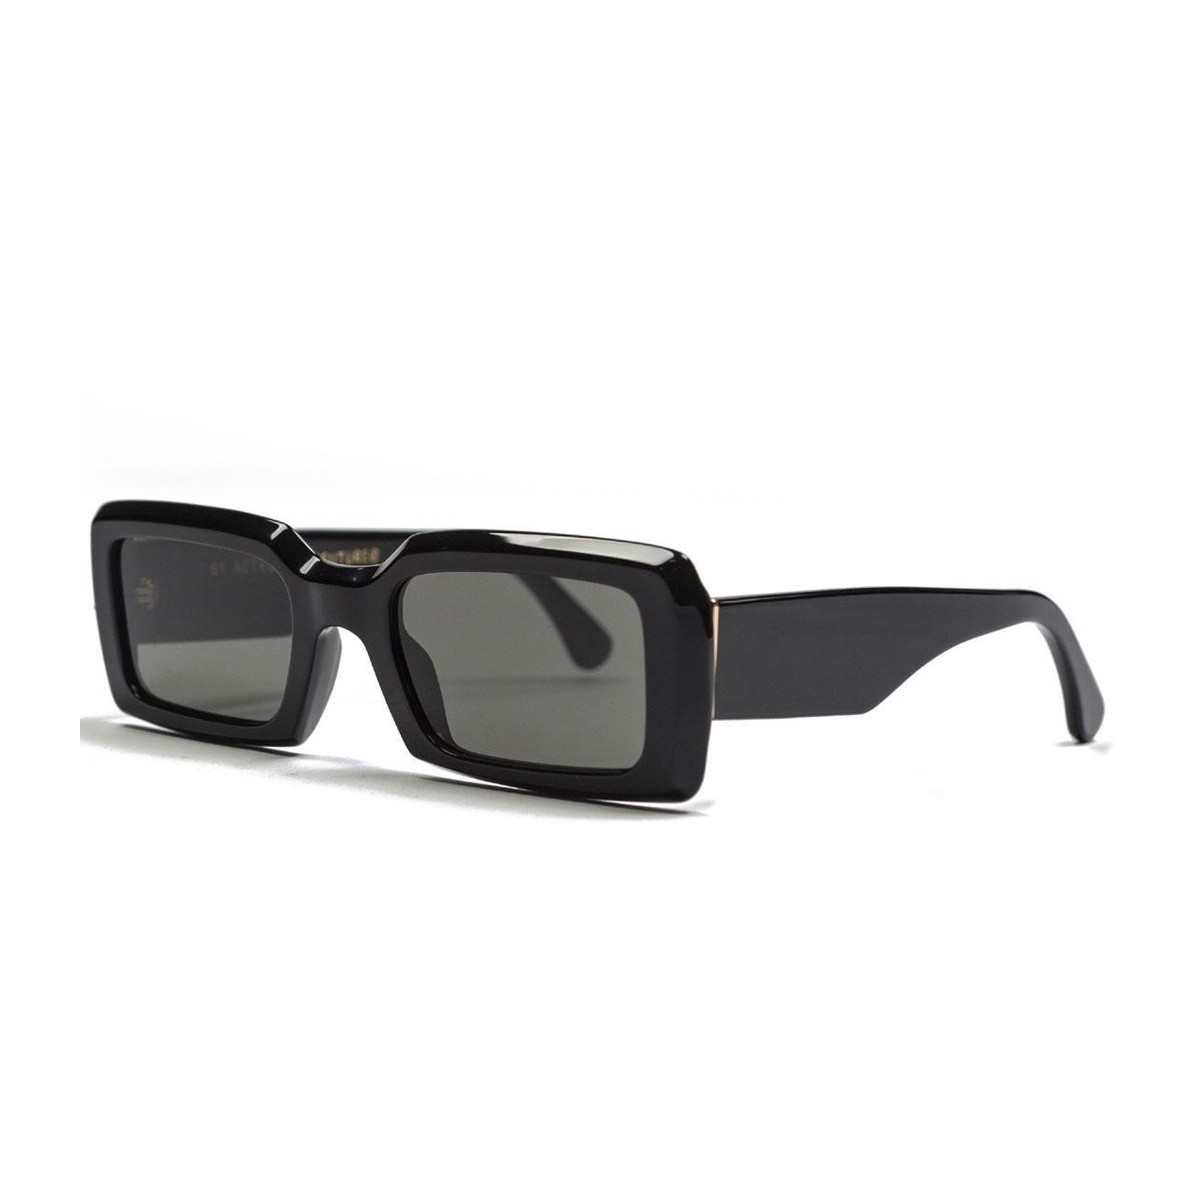 Super Sacro | Occhiali da sole Unisex